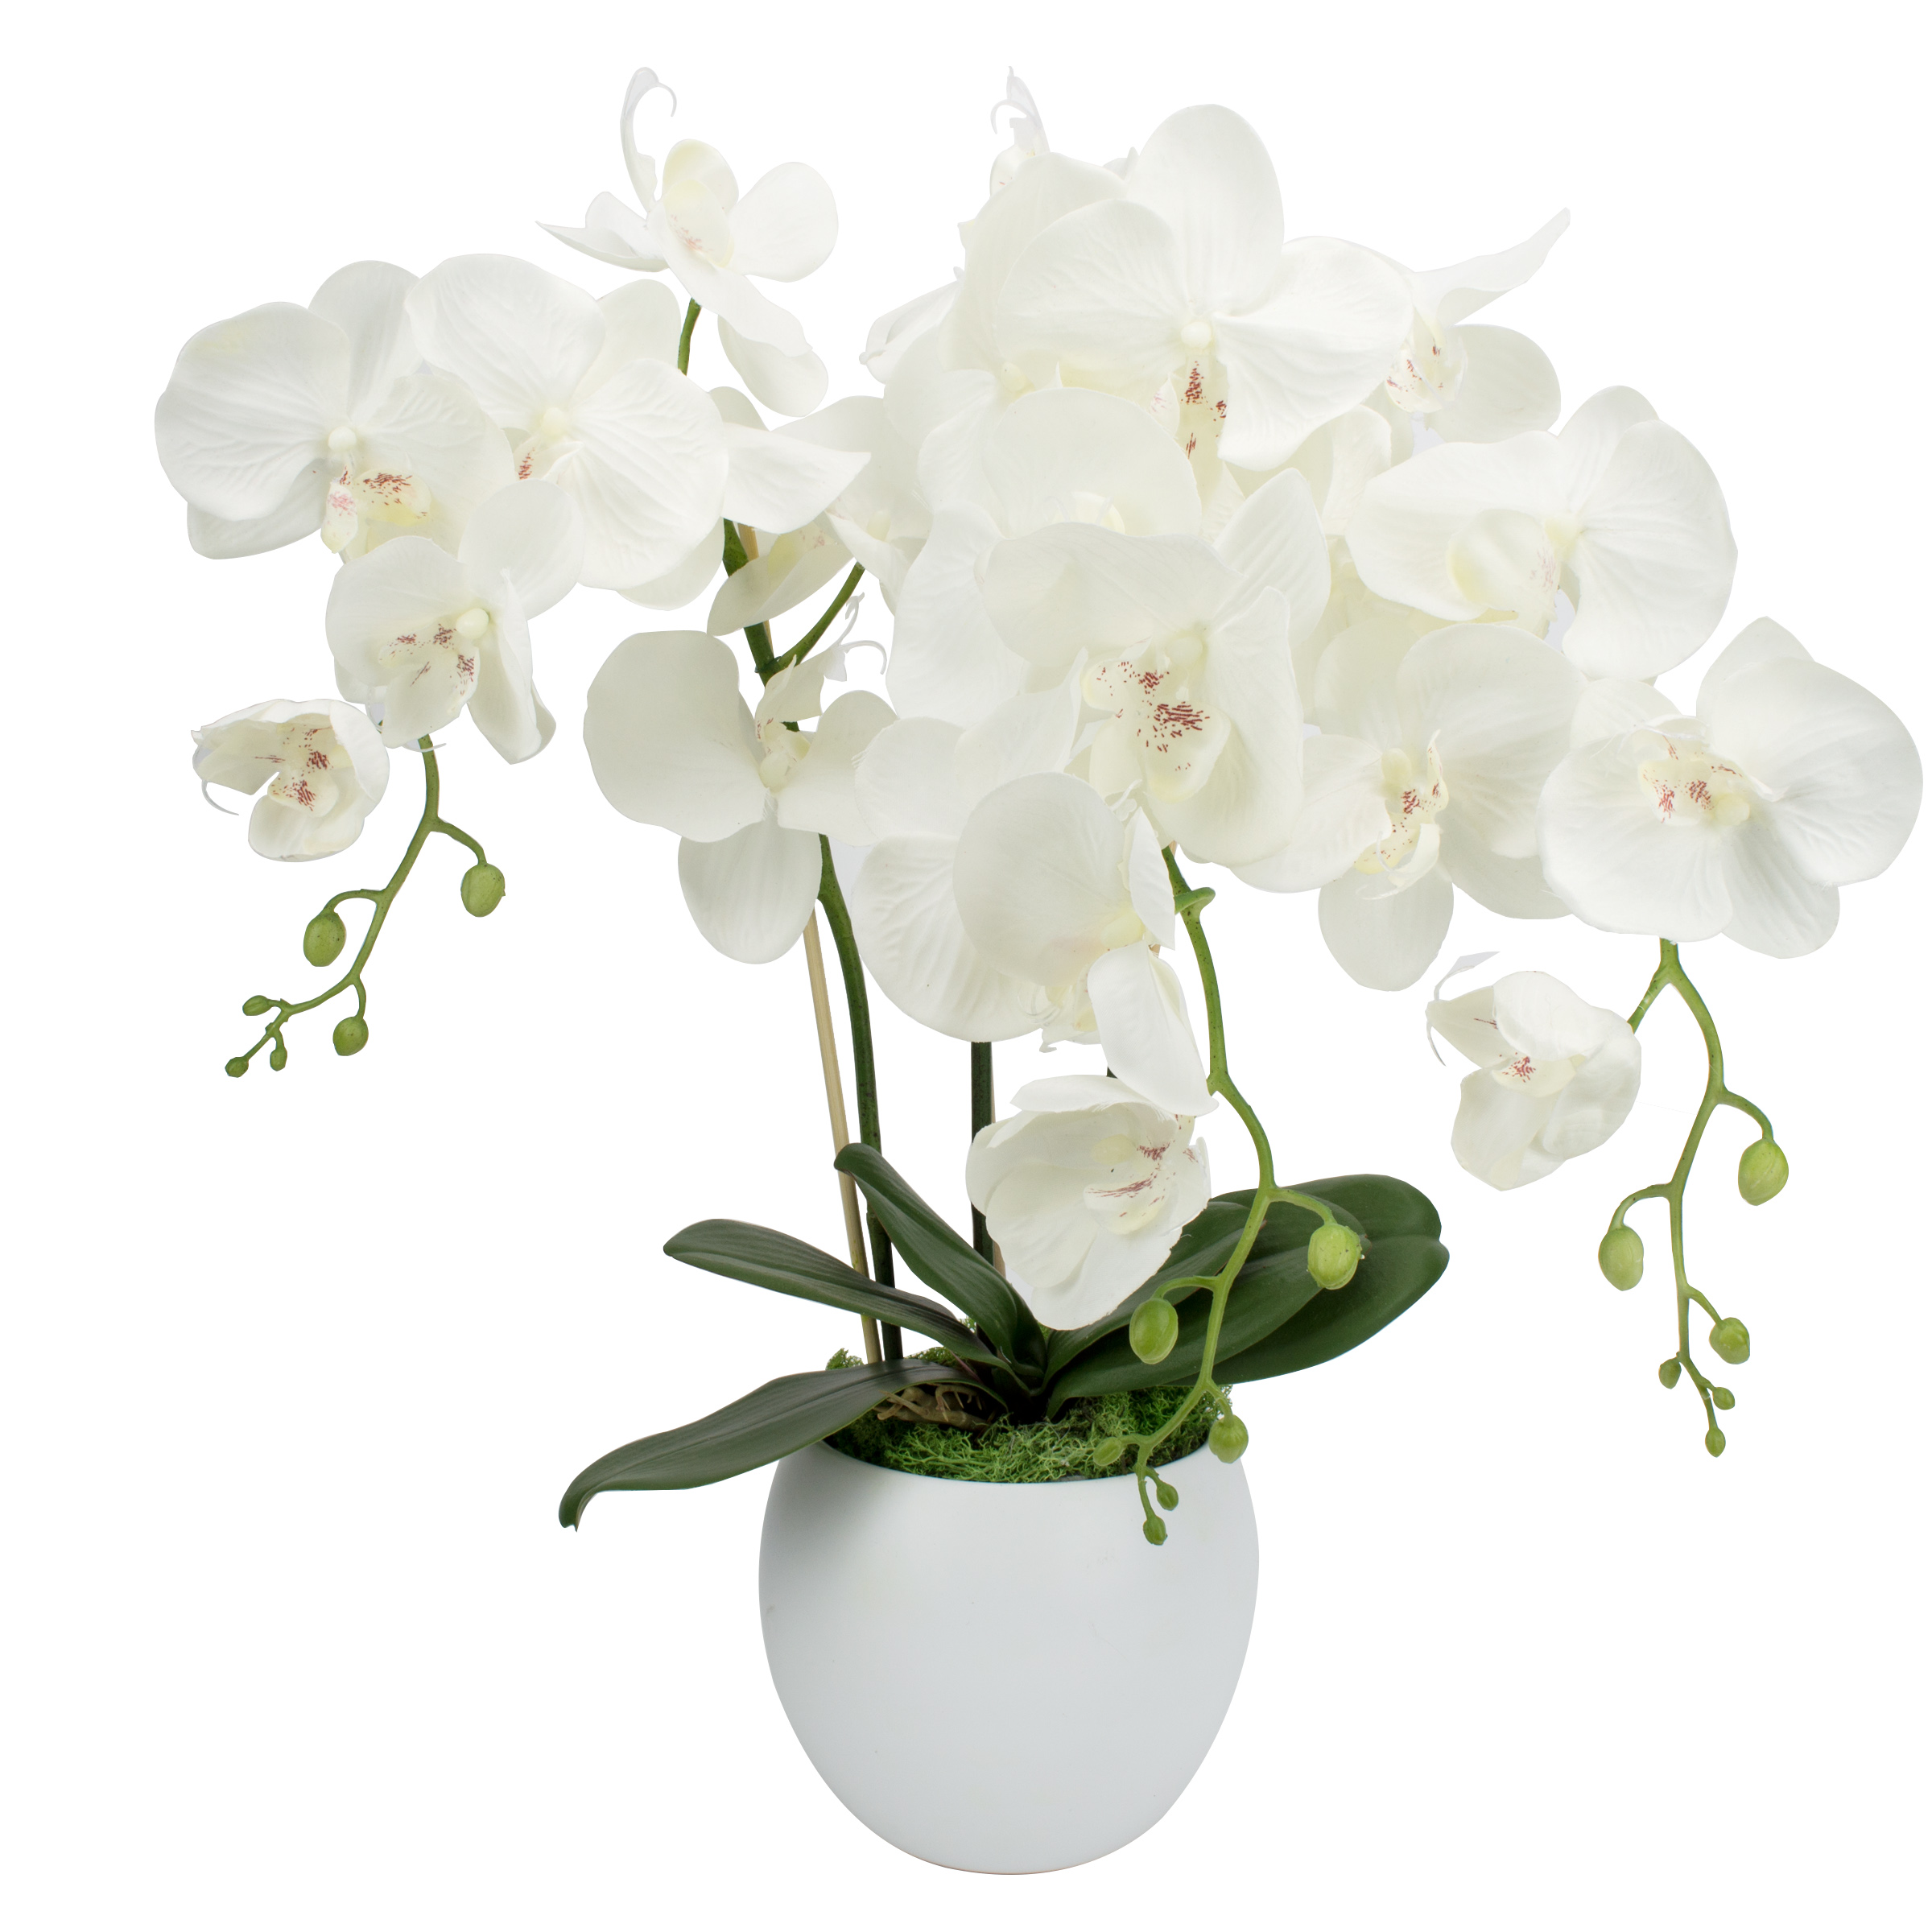 kunstblumen gesteck orchidee weiss vase fensterschmuck blumengesteck tisch deko ebay. Black Bedroom Furniture Sets. Home Design Ideas